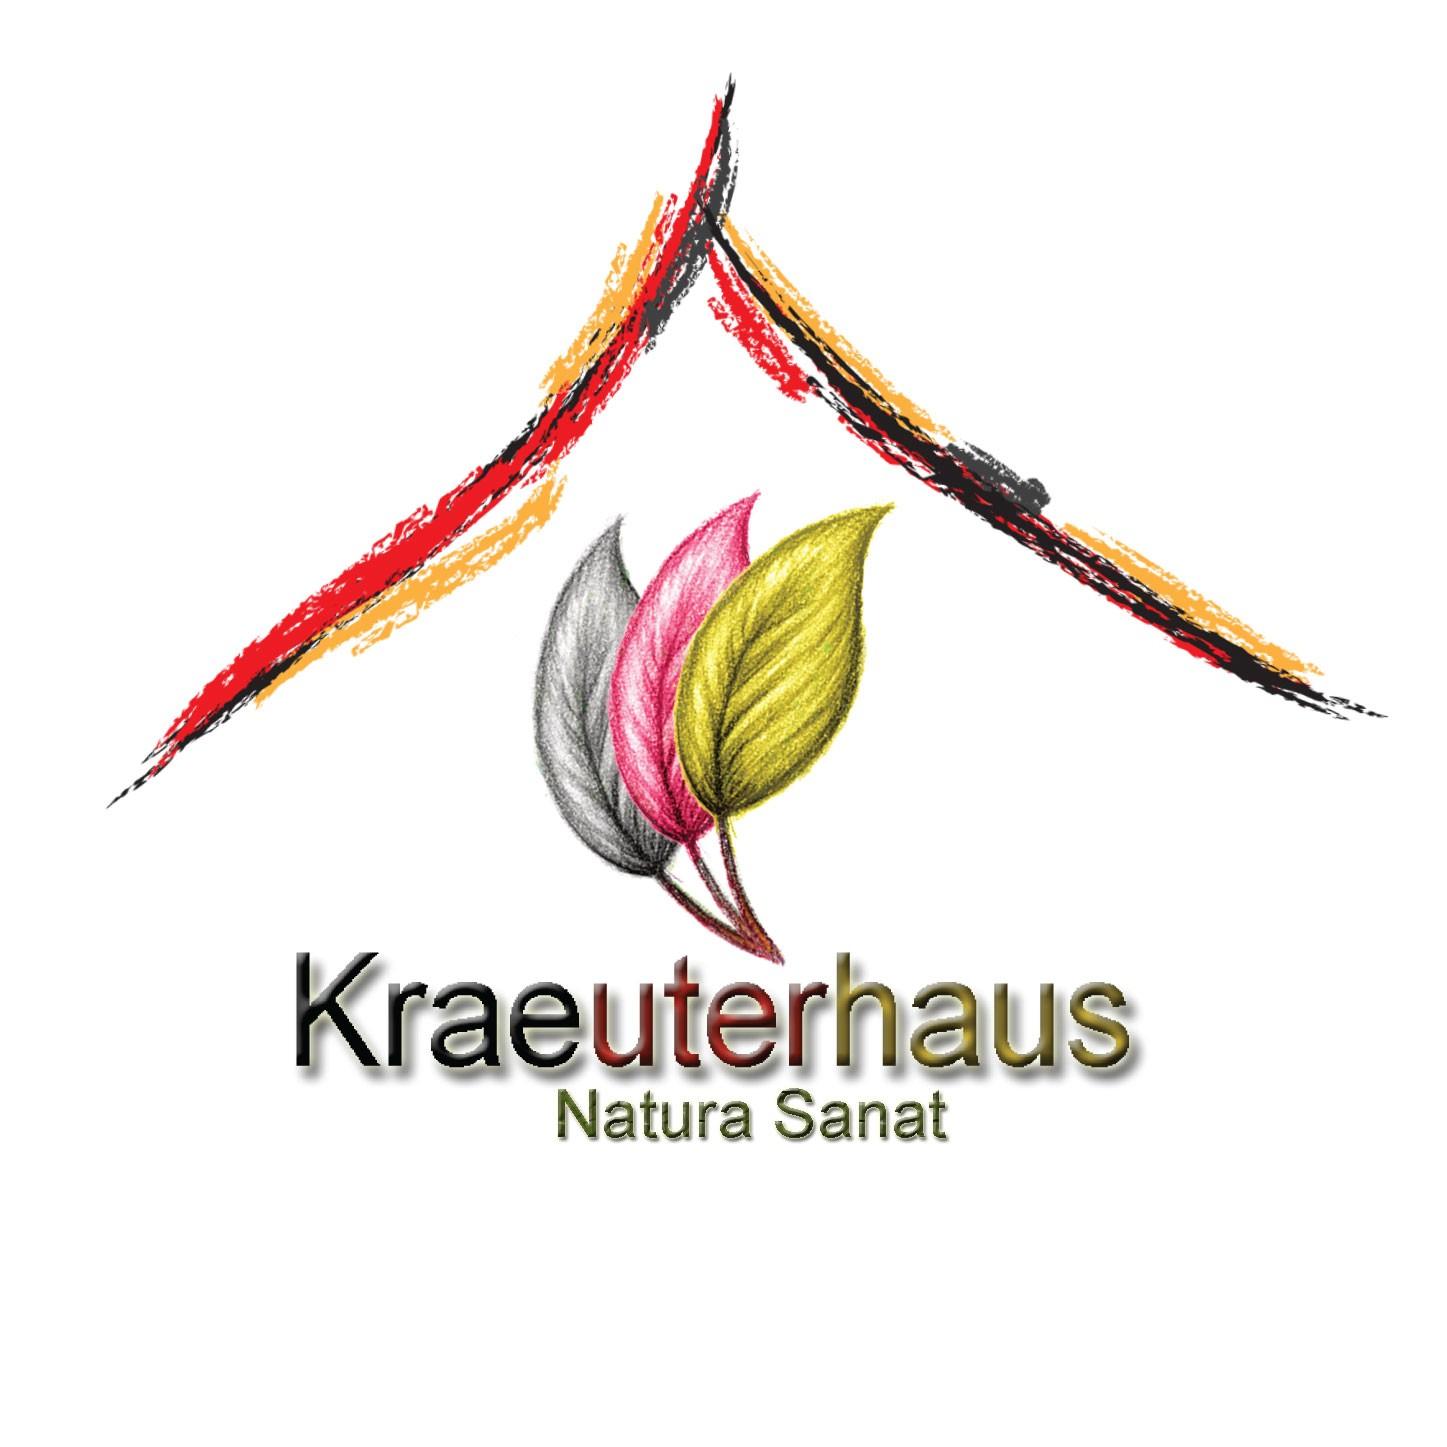 Kraeuterhaus Ltd.